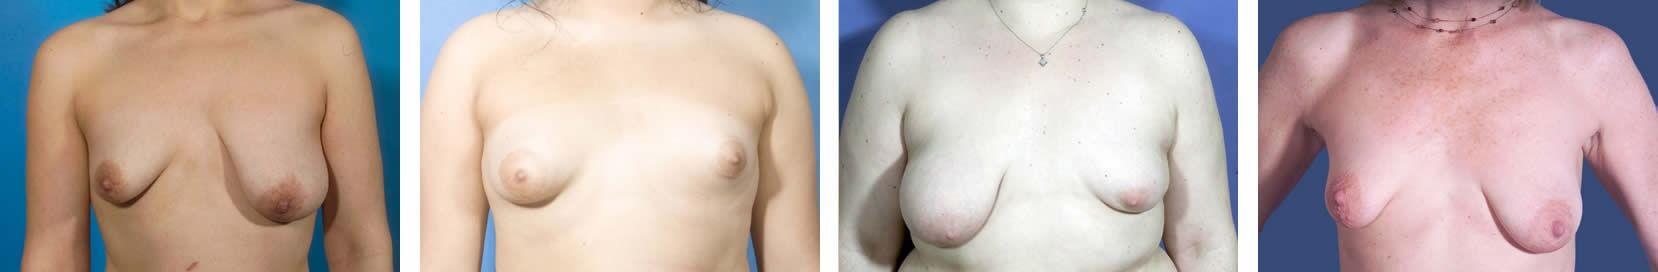 Tuberous breast deformity examples